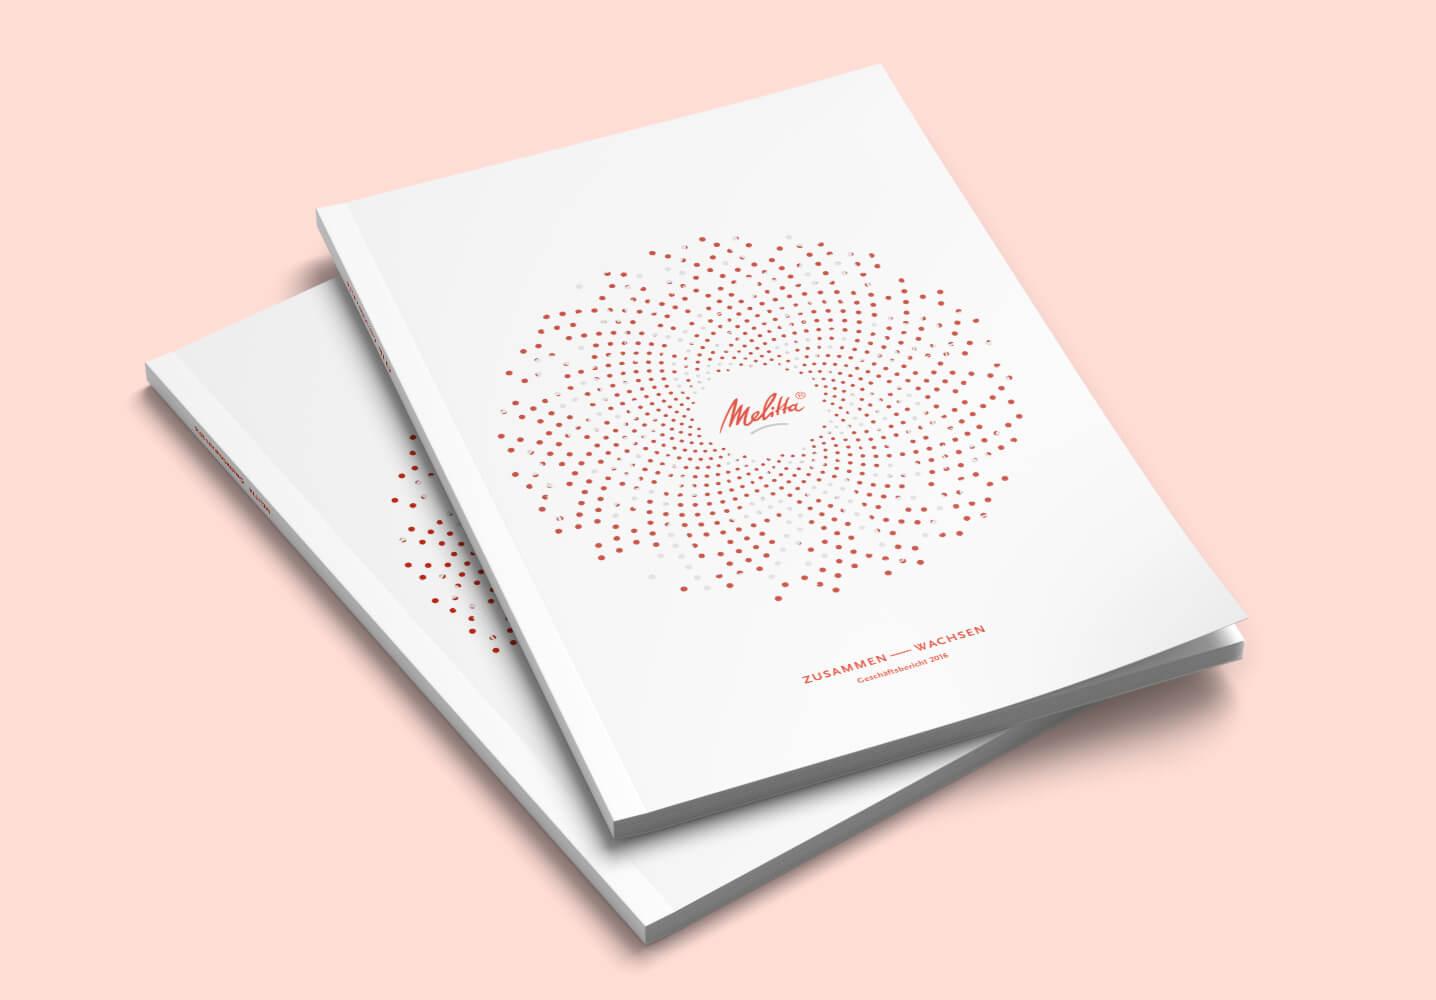 Melitta annual report 2016 cover